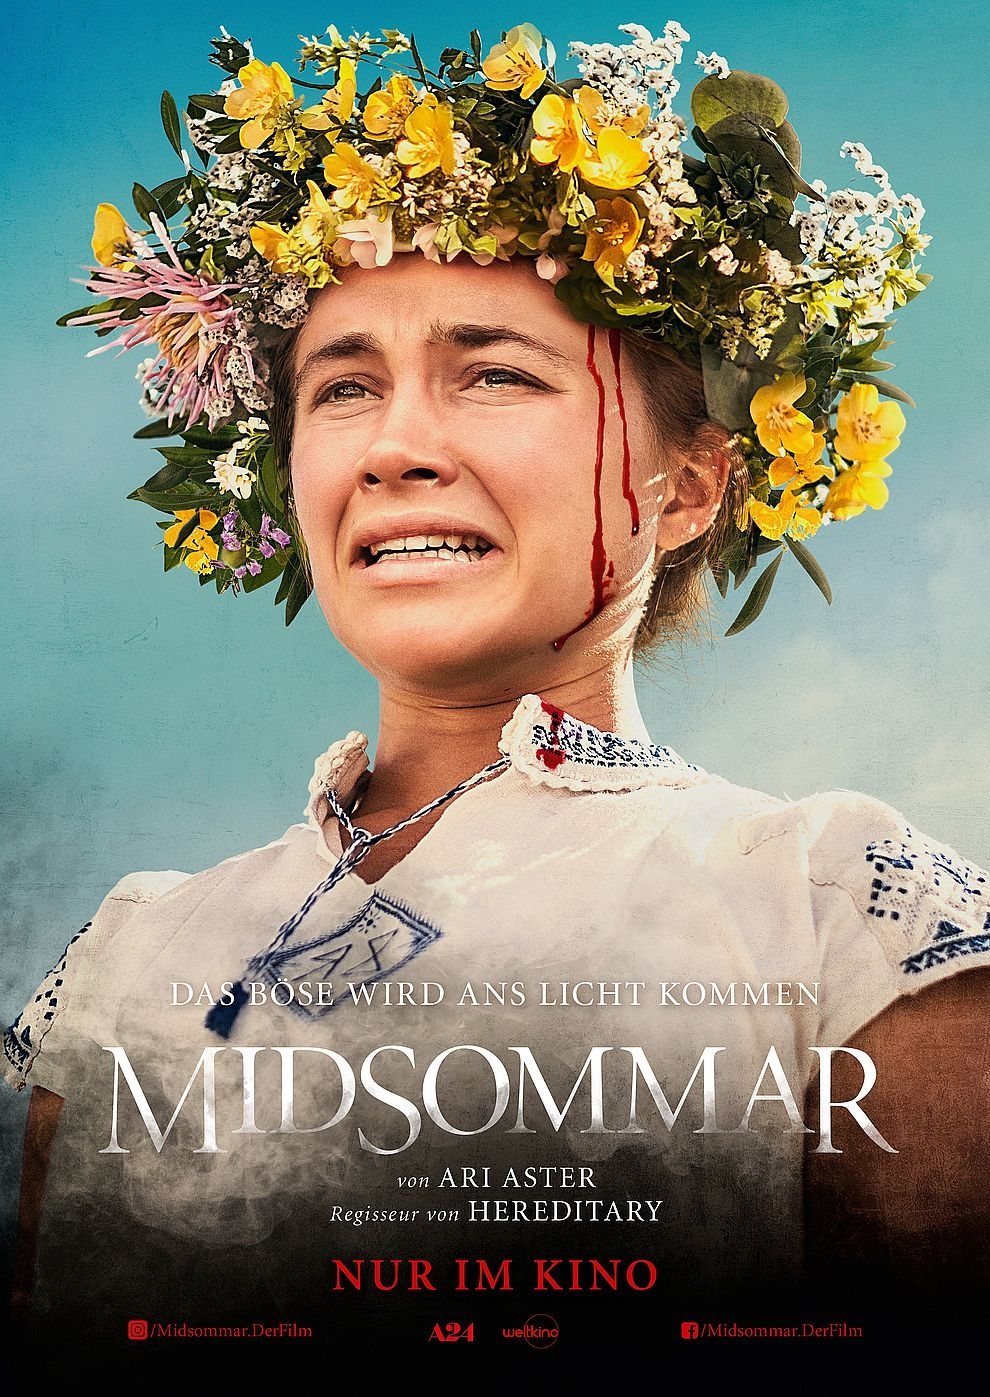 Midsommar (Poster)